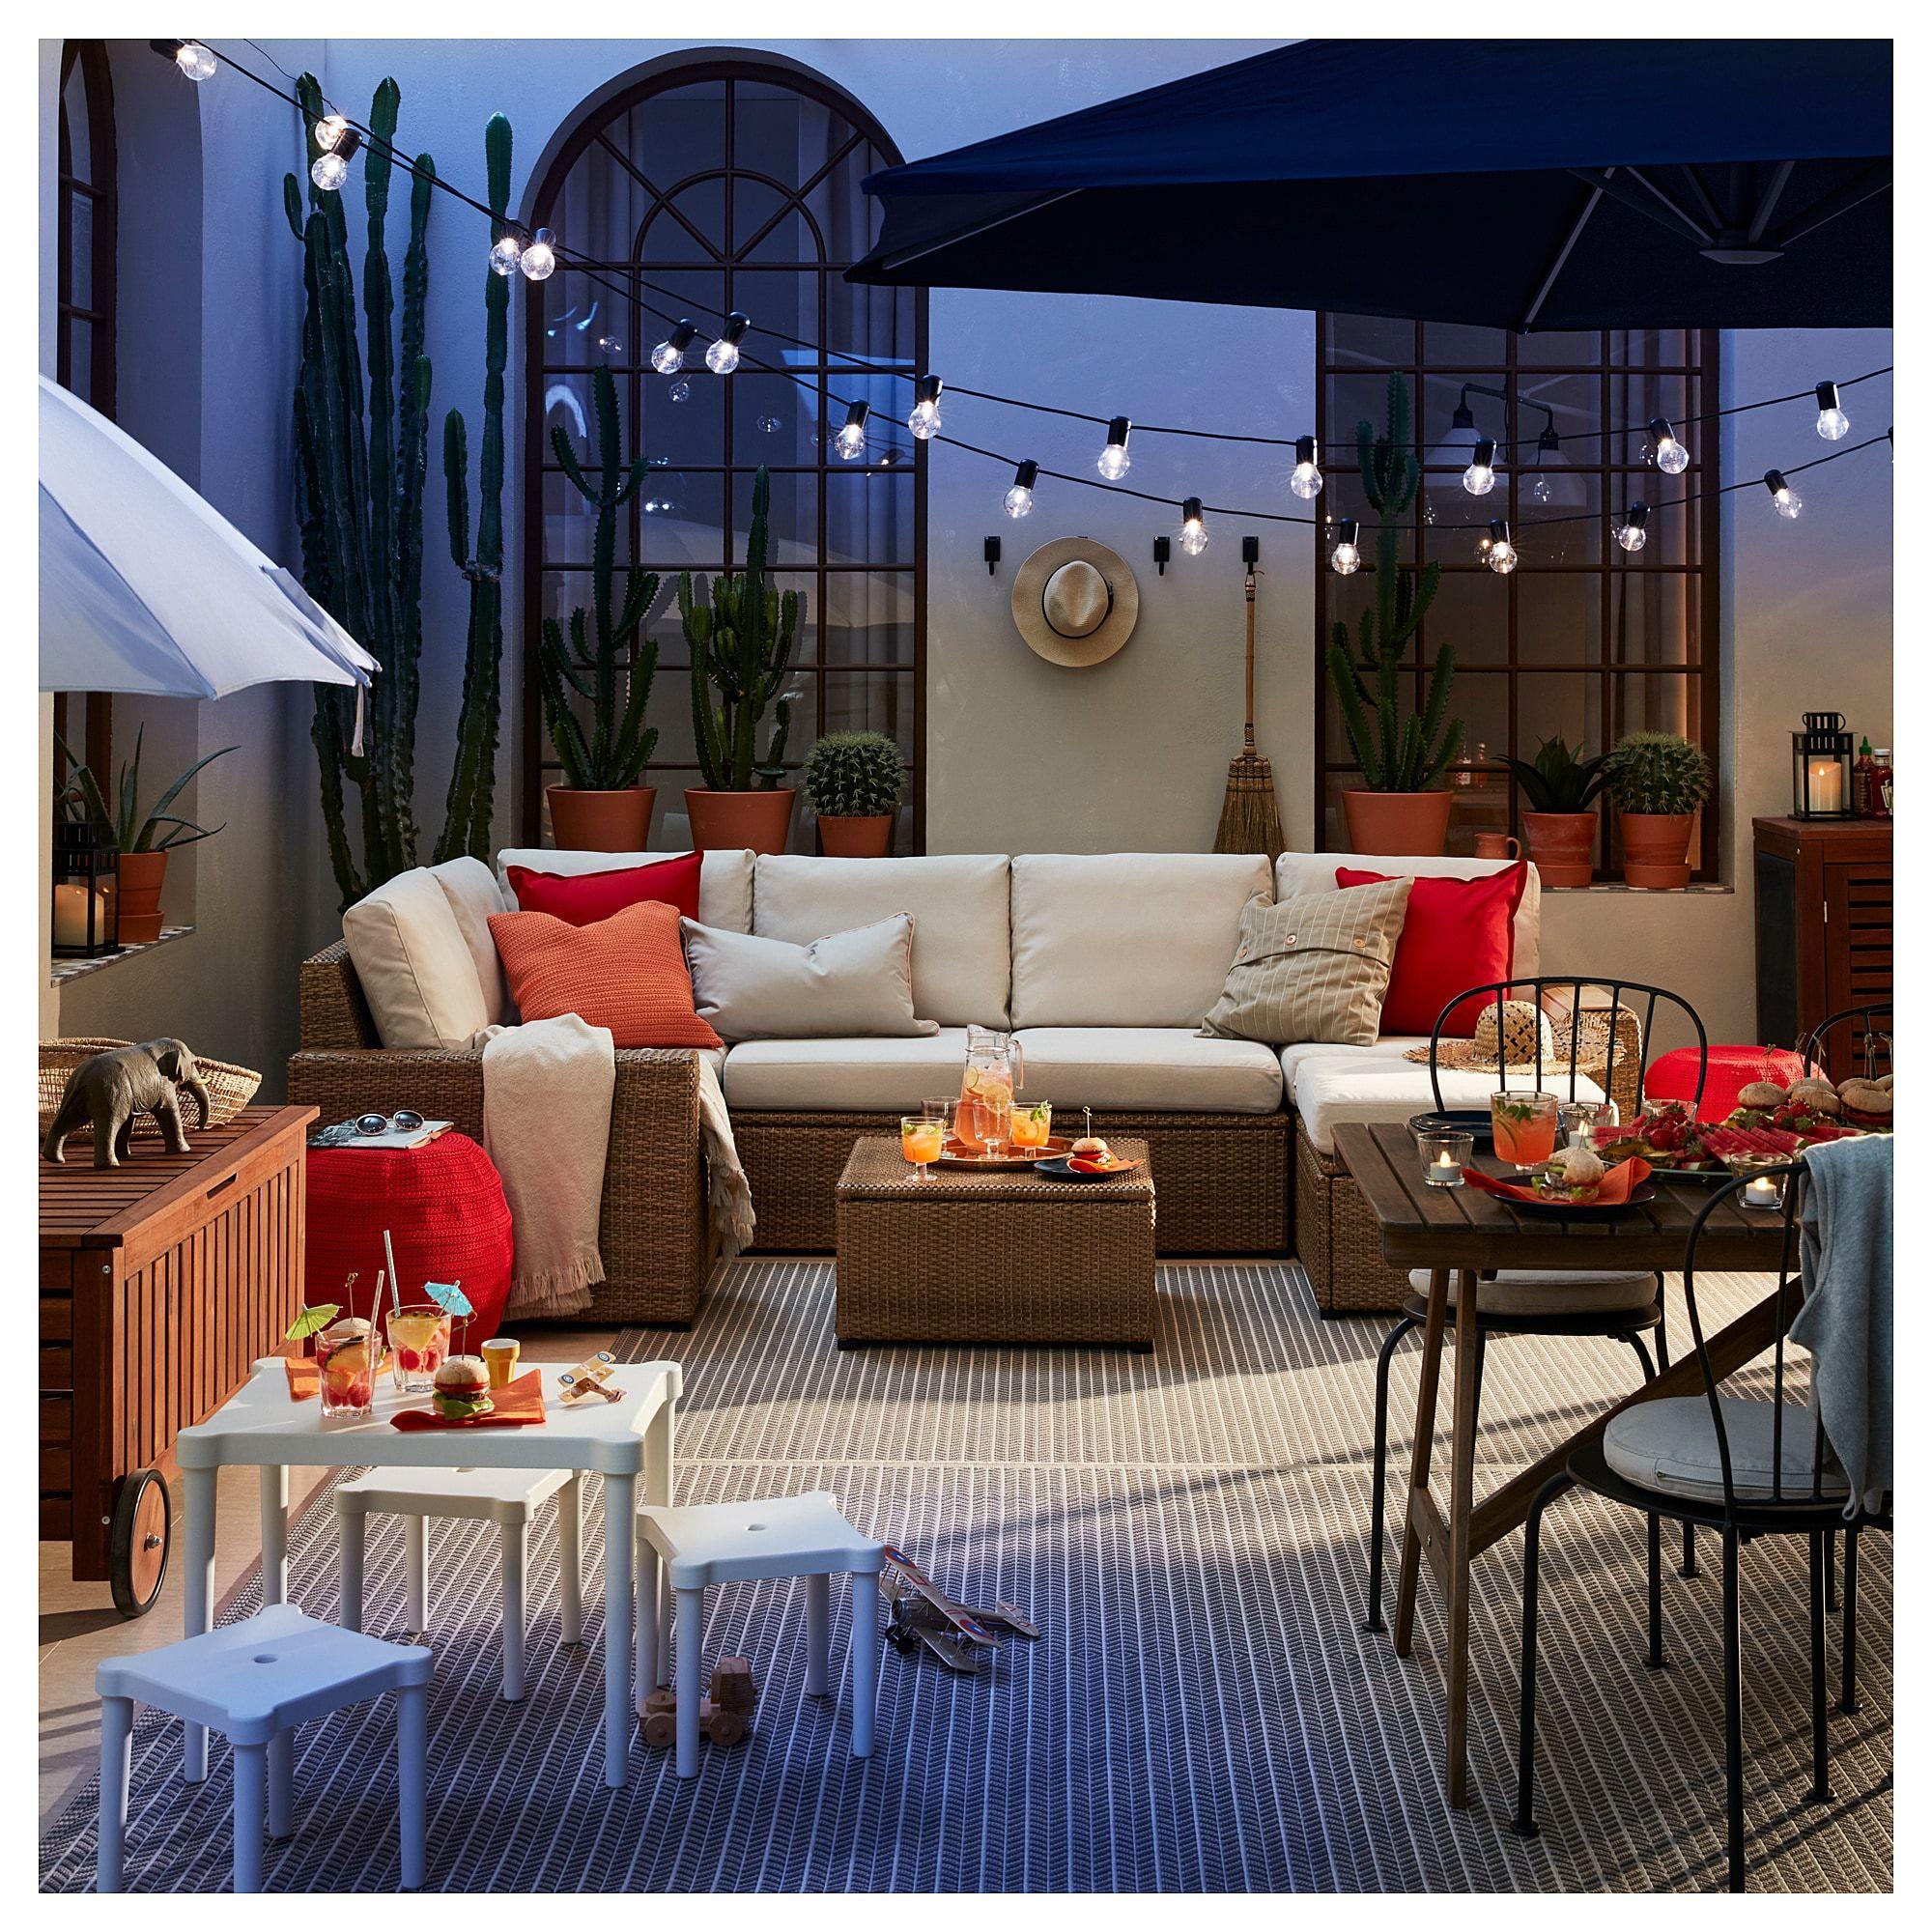 Solleron Modular Corner Sofa 4 Seat Outdoor With Footstool Brown Brown Froson Duvholmen Beige In 2020 Modular Corner Sofa Outdoor Patio Designs Corner Sofa